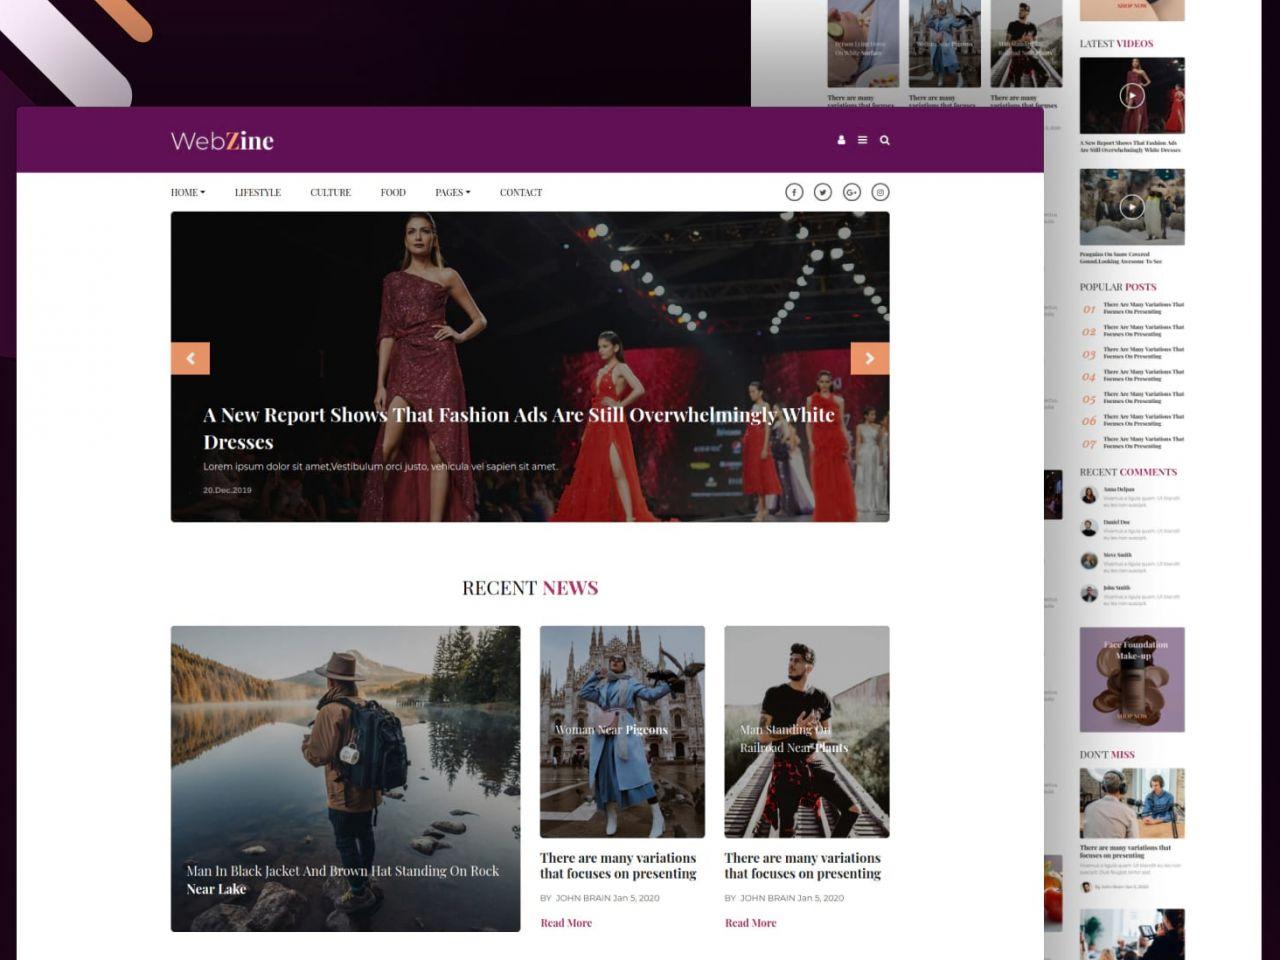 Webzine-生活博客网站模板